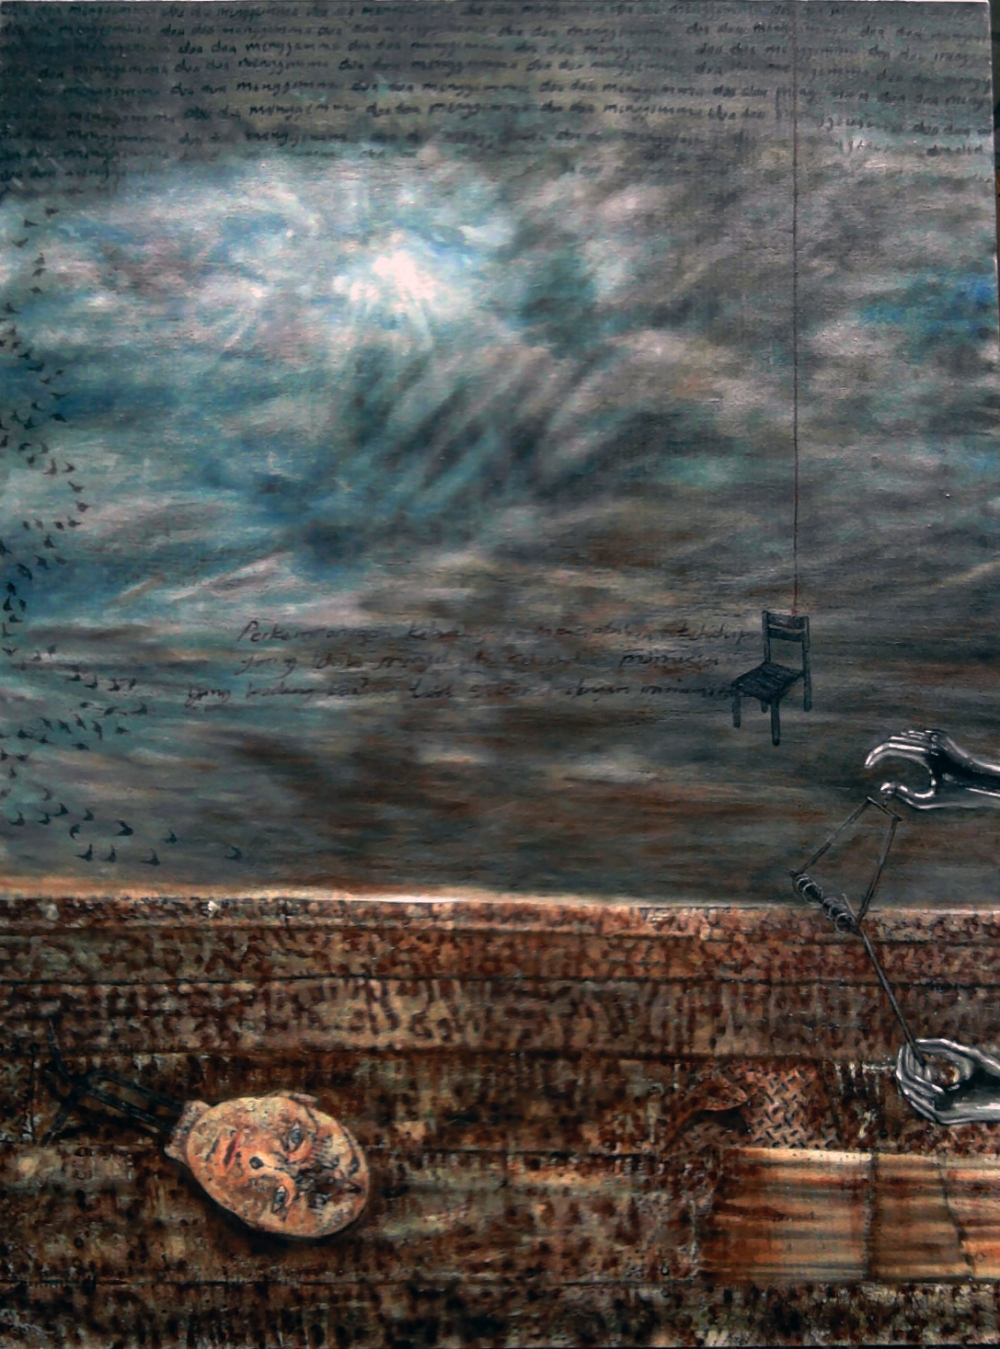 Galeri ISI Surakarta.Peinture.Blessure la terre appartient a tout le monde. Hendra Purnama.Automne 2085